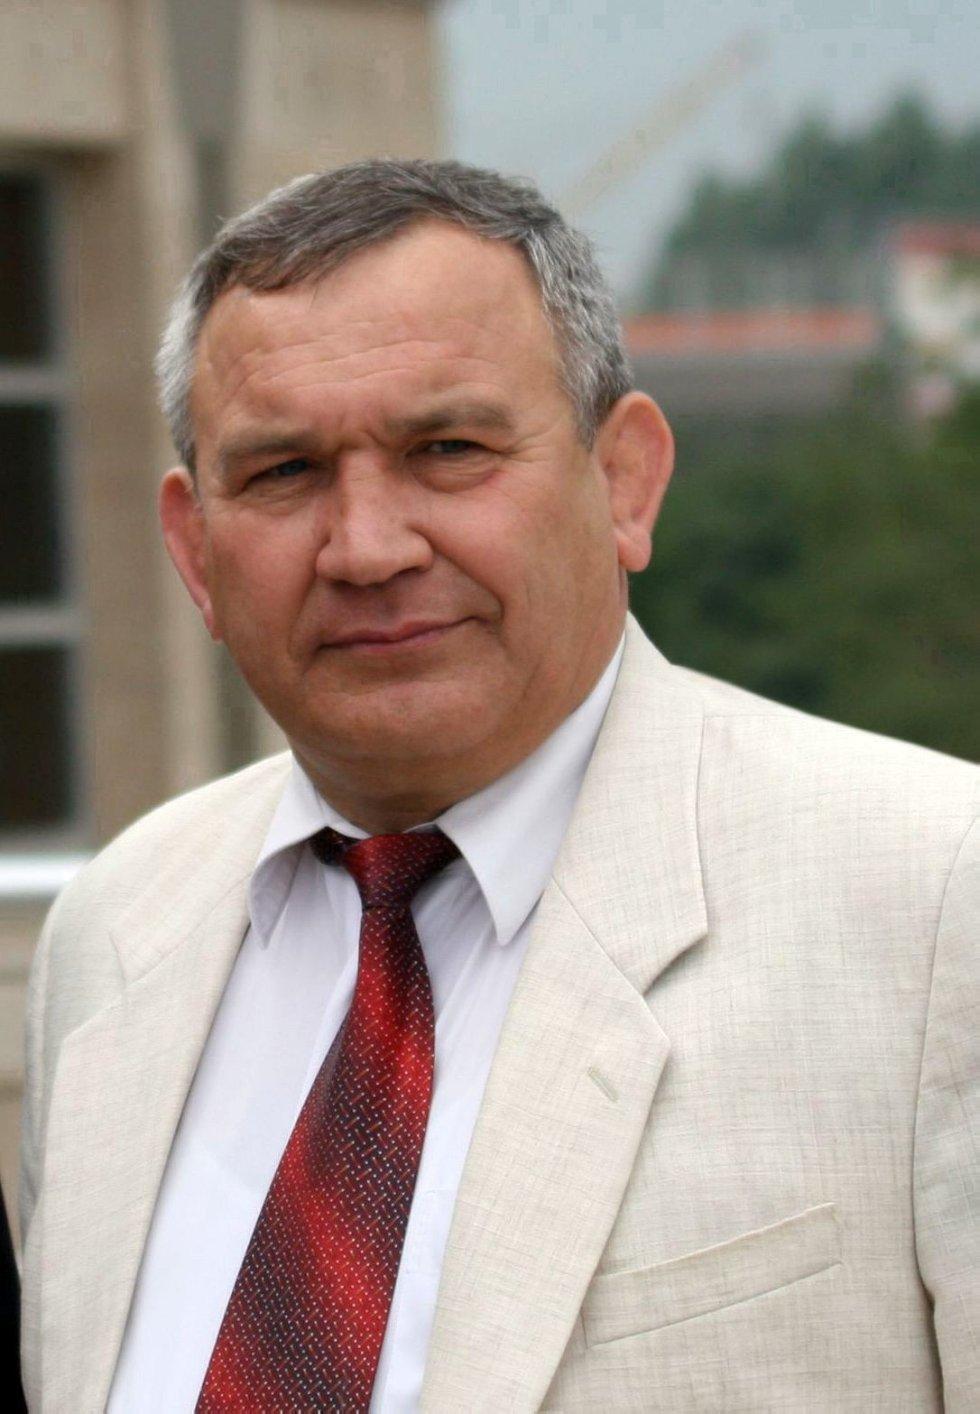 Ахметов Фриль Мирзанурович